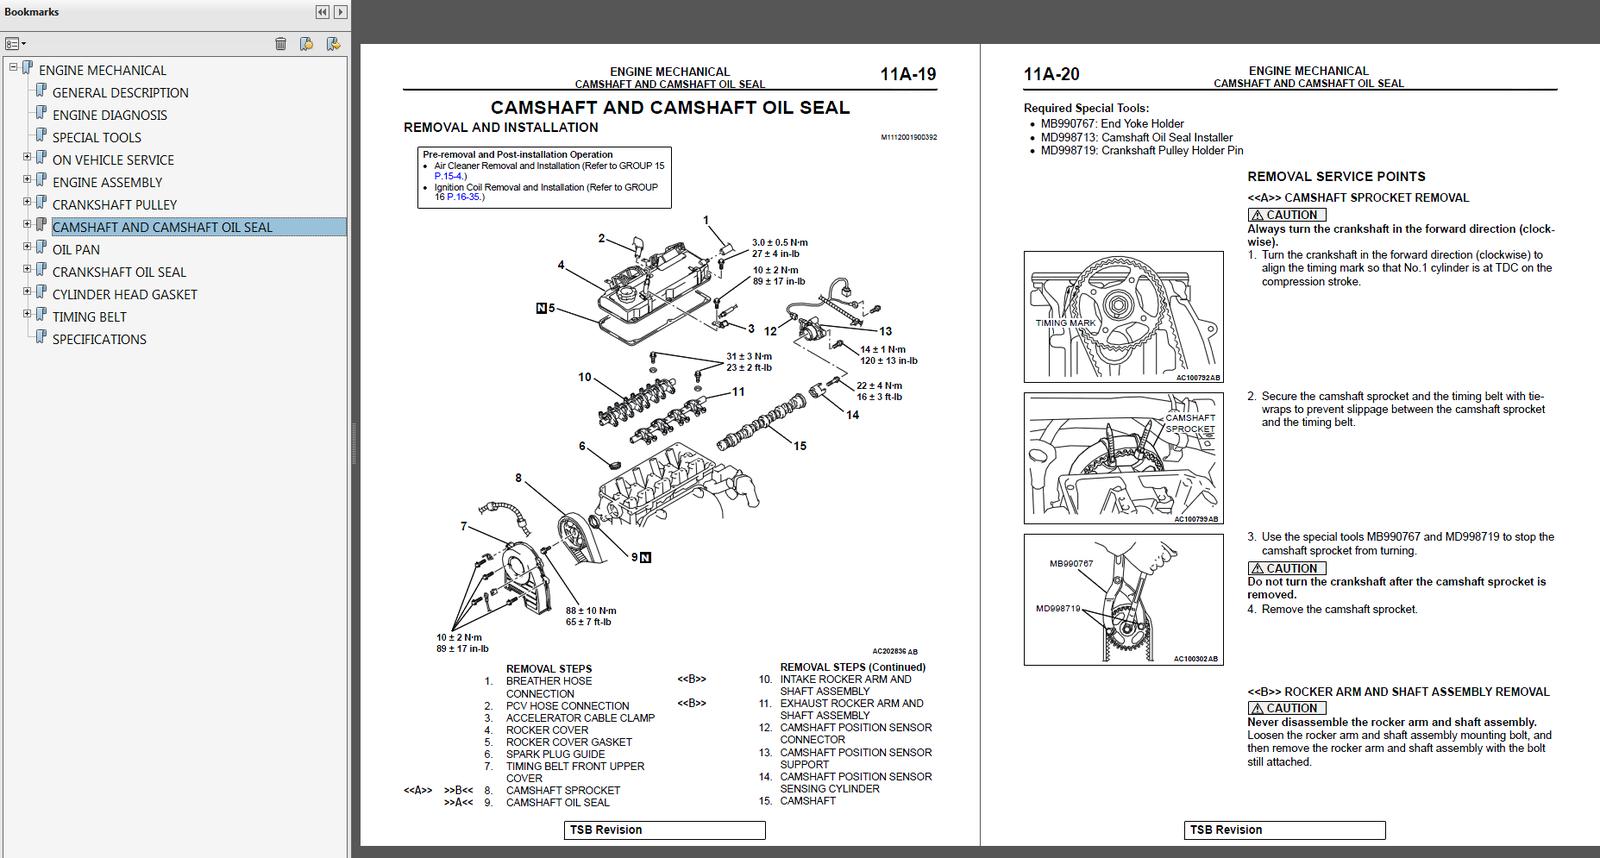 2002 2003 mitsubishi lancer factory repair and 50 similar items rh bonanza com 2002 mitsubishi lancer workshop manual 2002 mitsubishi lancer service manual free